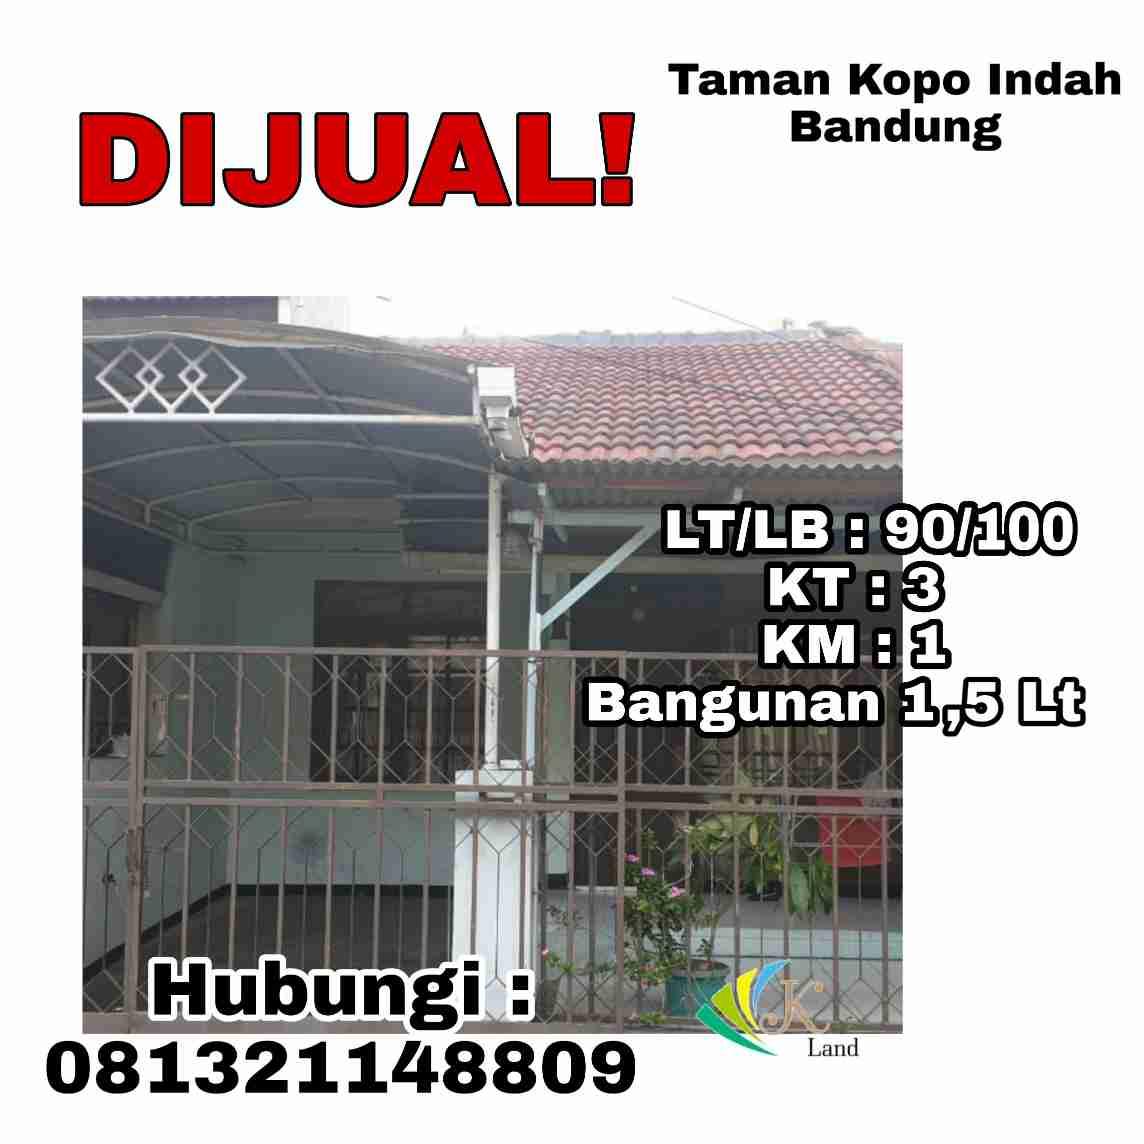 Dijual Hunian Taman Kopo Indah Bandung